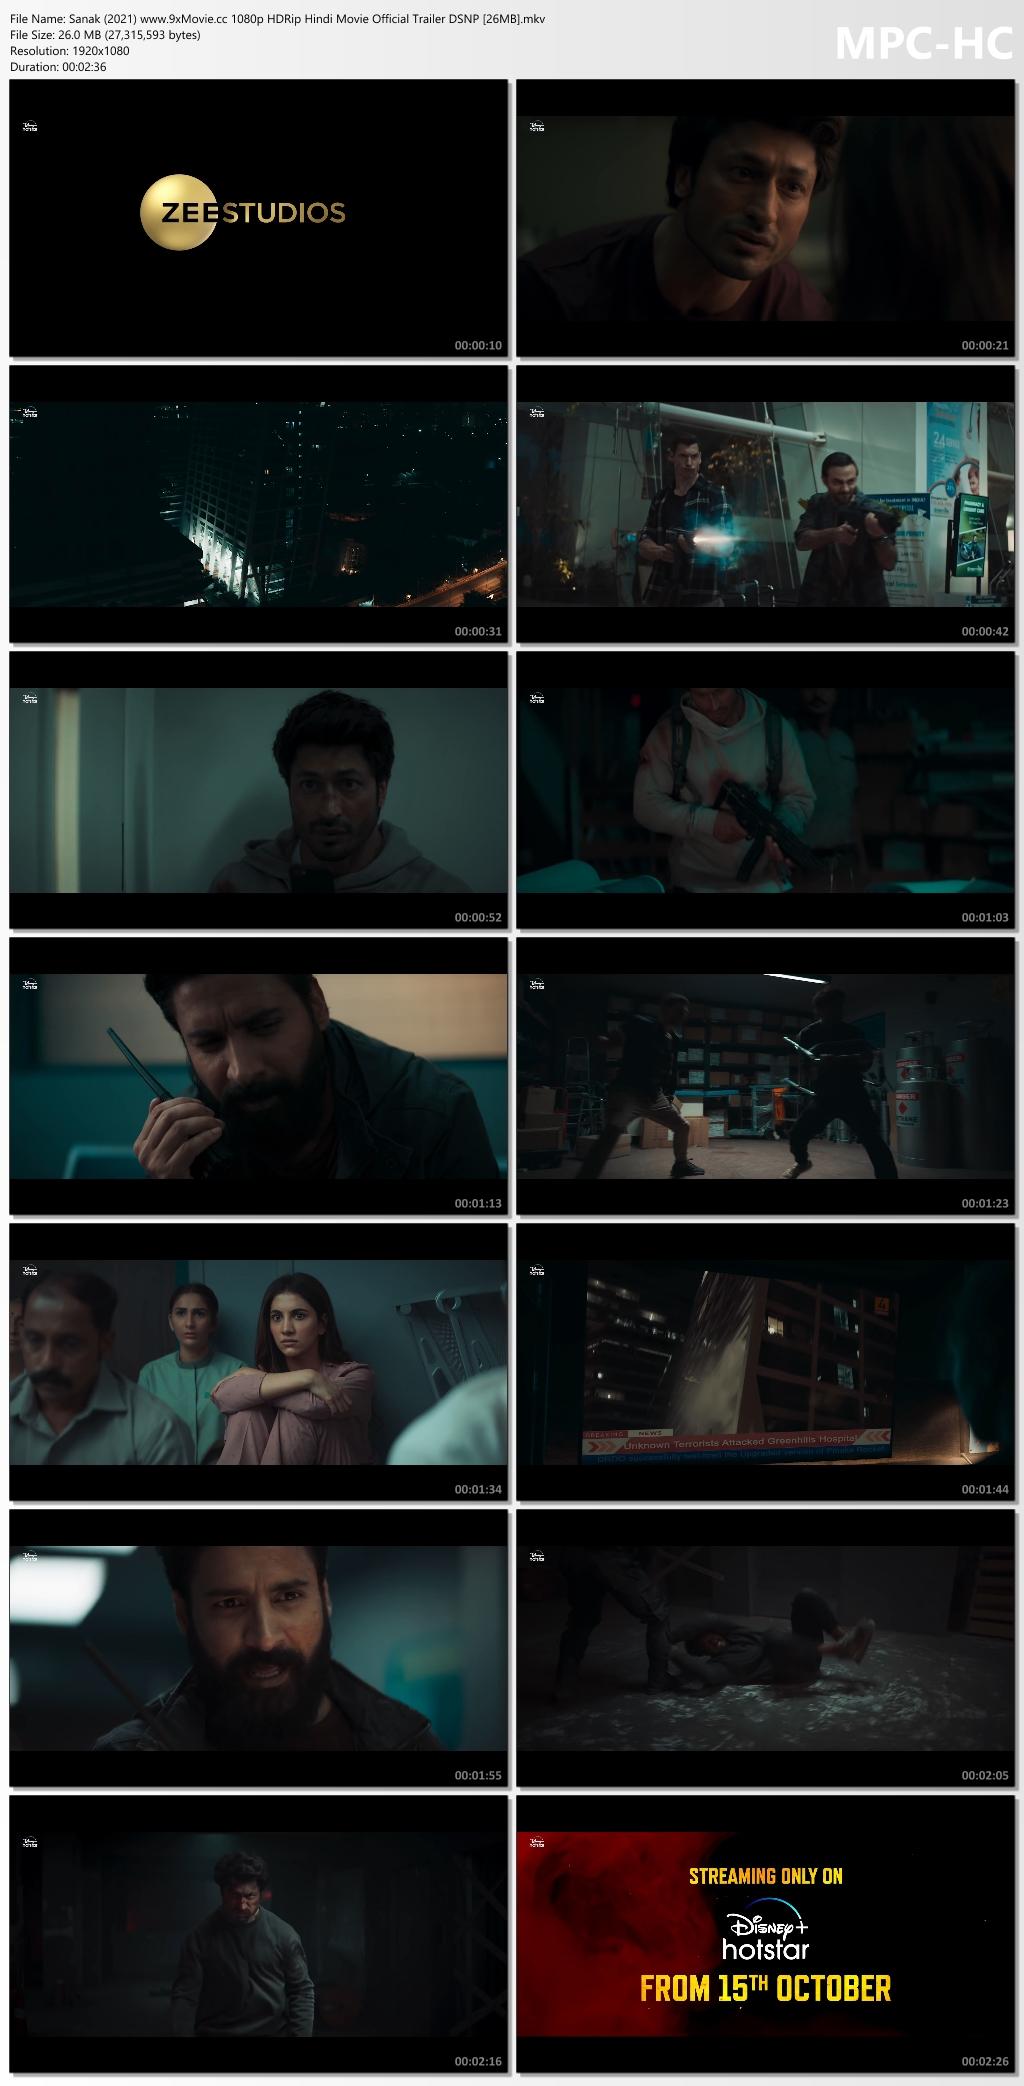 Sanak-2021-www-9x-Movie-cc-1080p-HDRip-Hindi-Movie-Official-Trailer-DSNP-26-MB-mkv